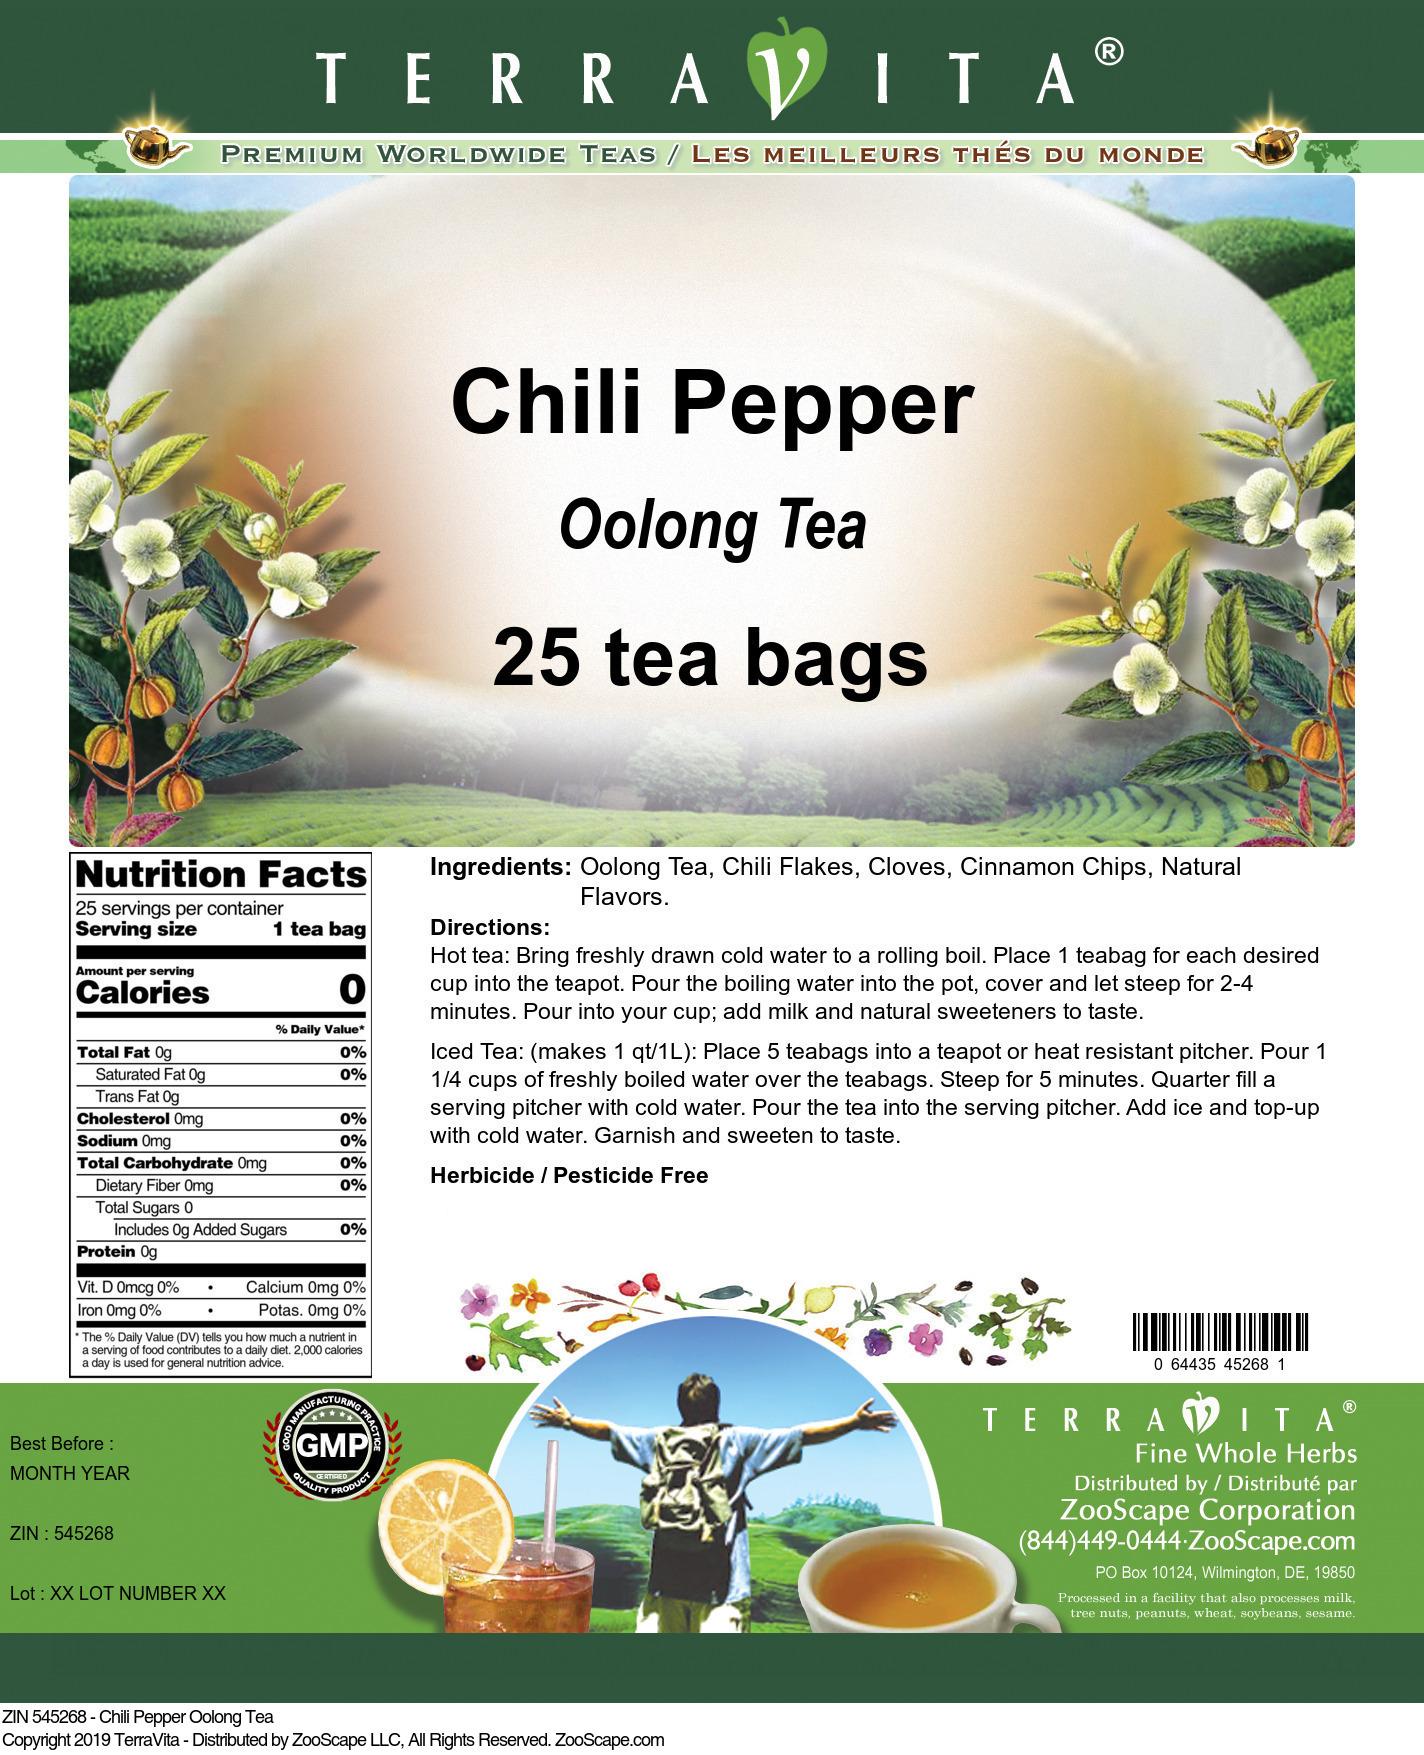 Chili Pepper Oolong Tea